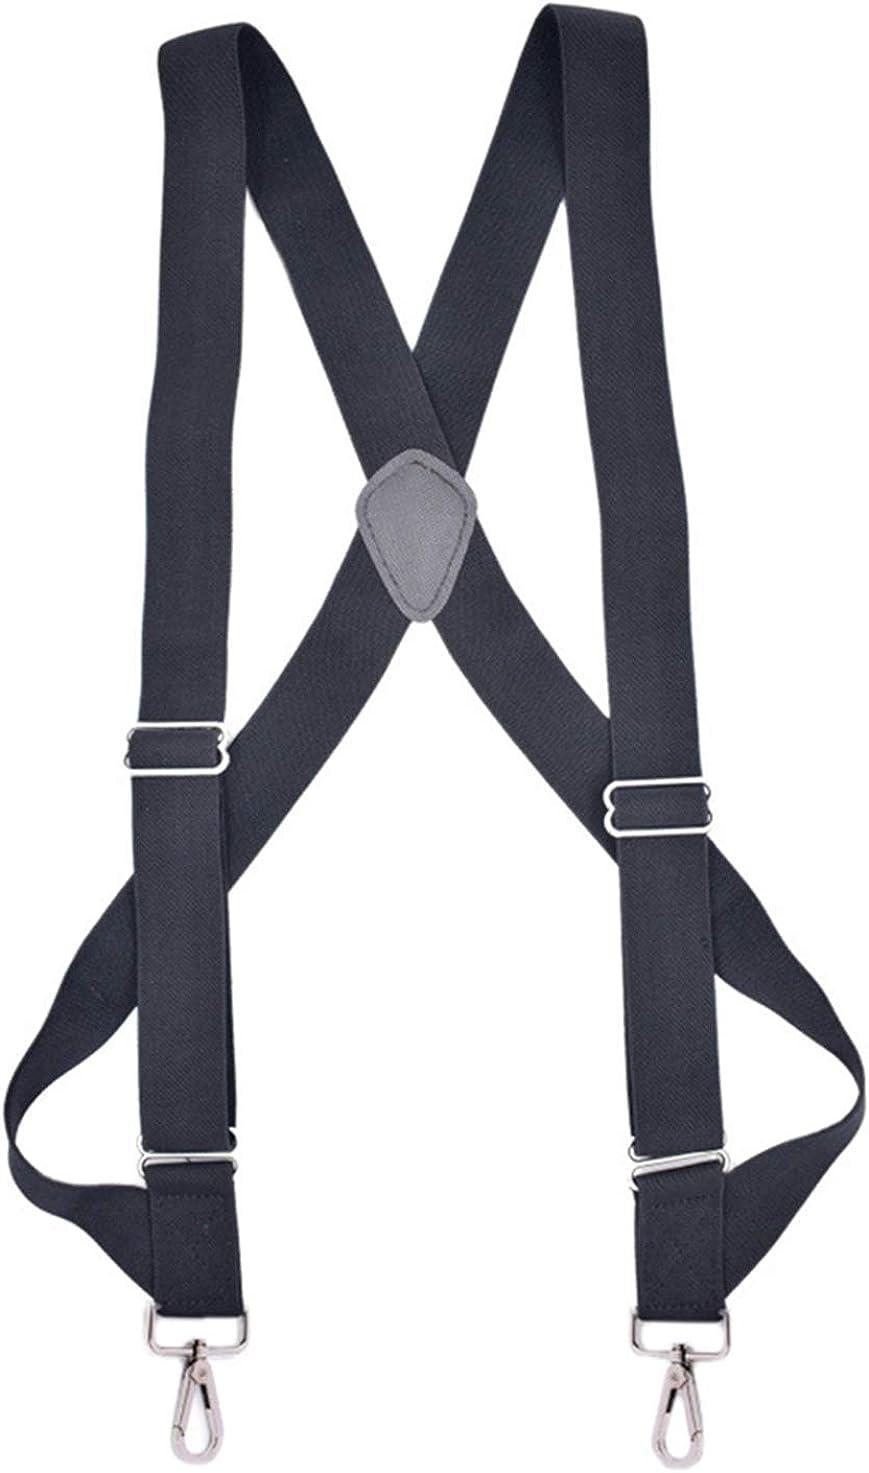 JTCMOJS Mens Trucker Side Clip Suspenders Heavy Duty X Back 1.4